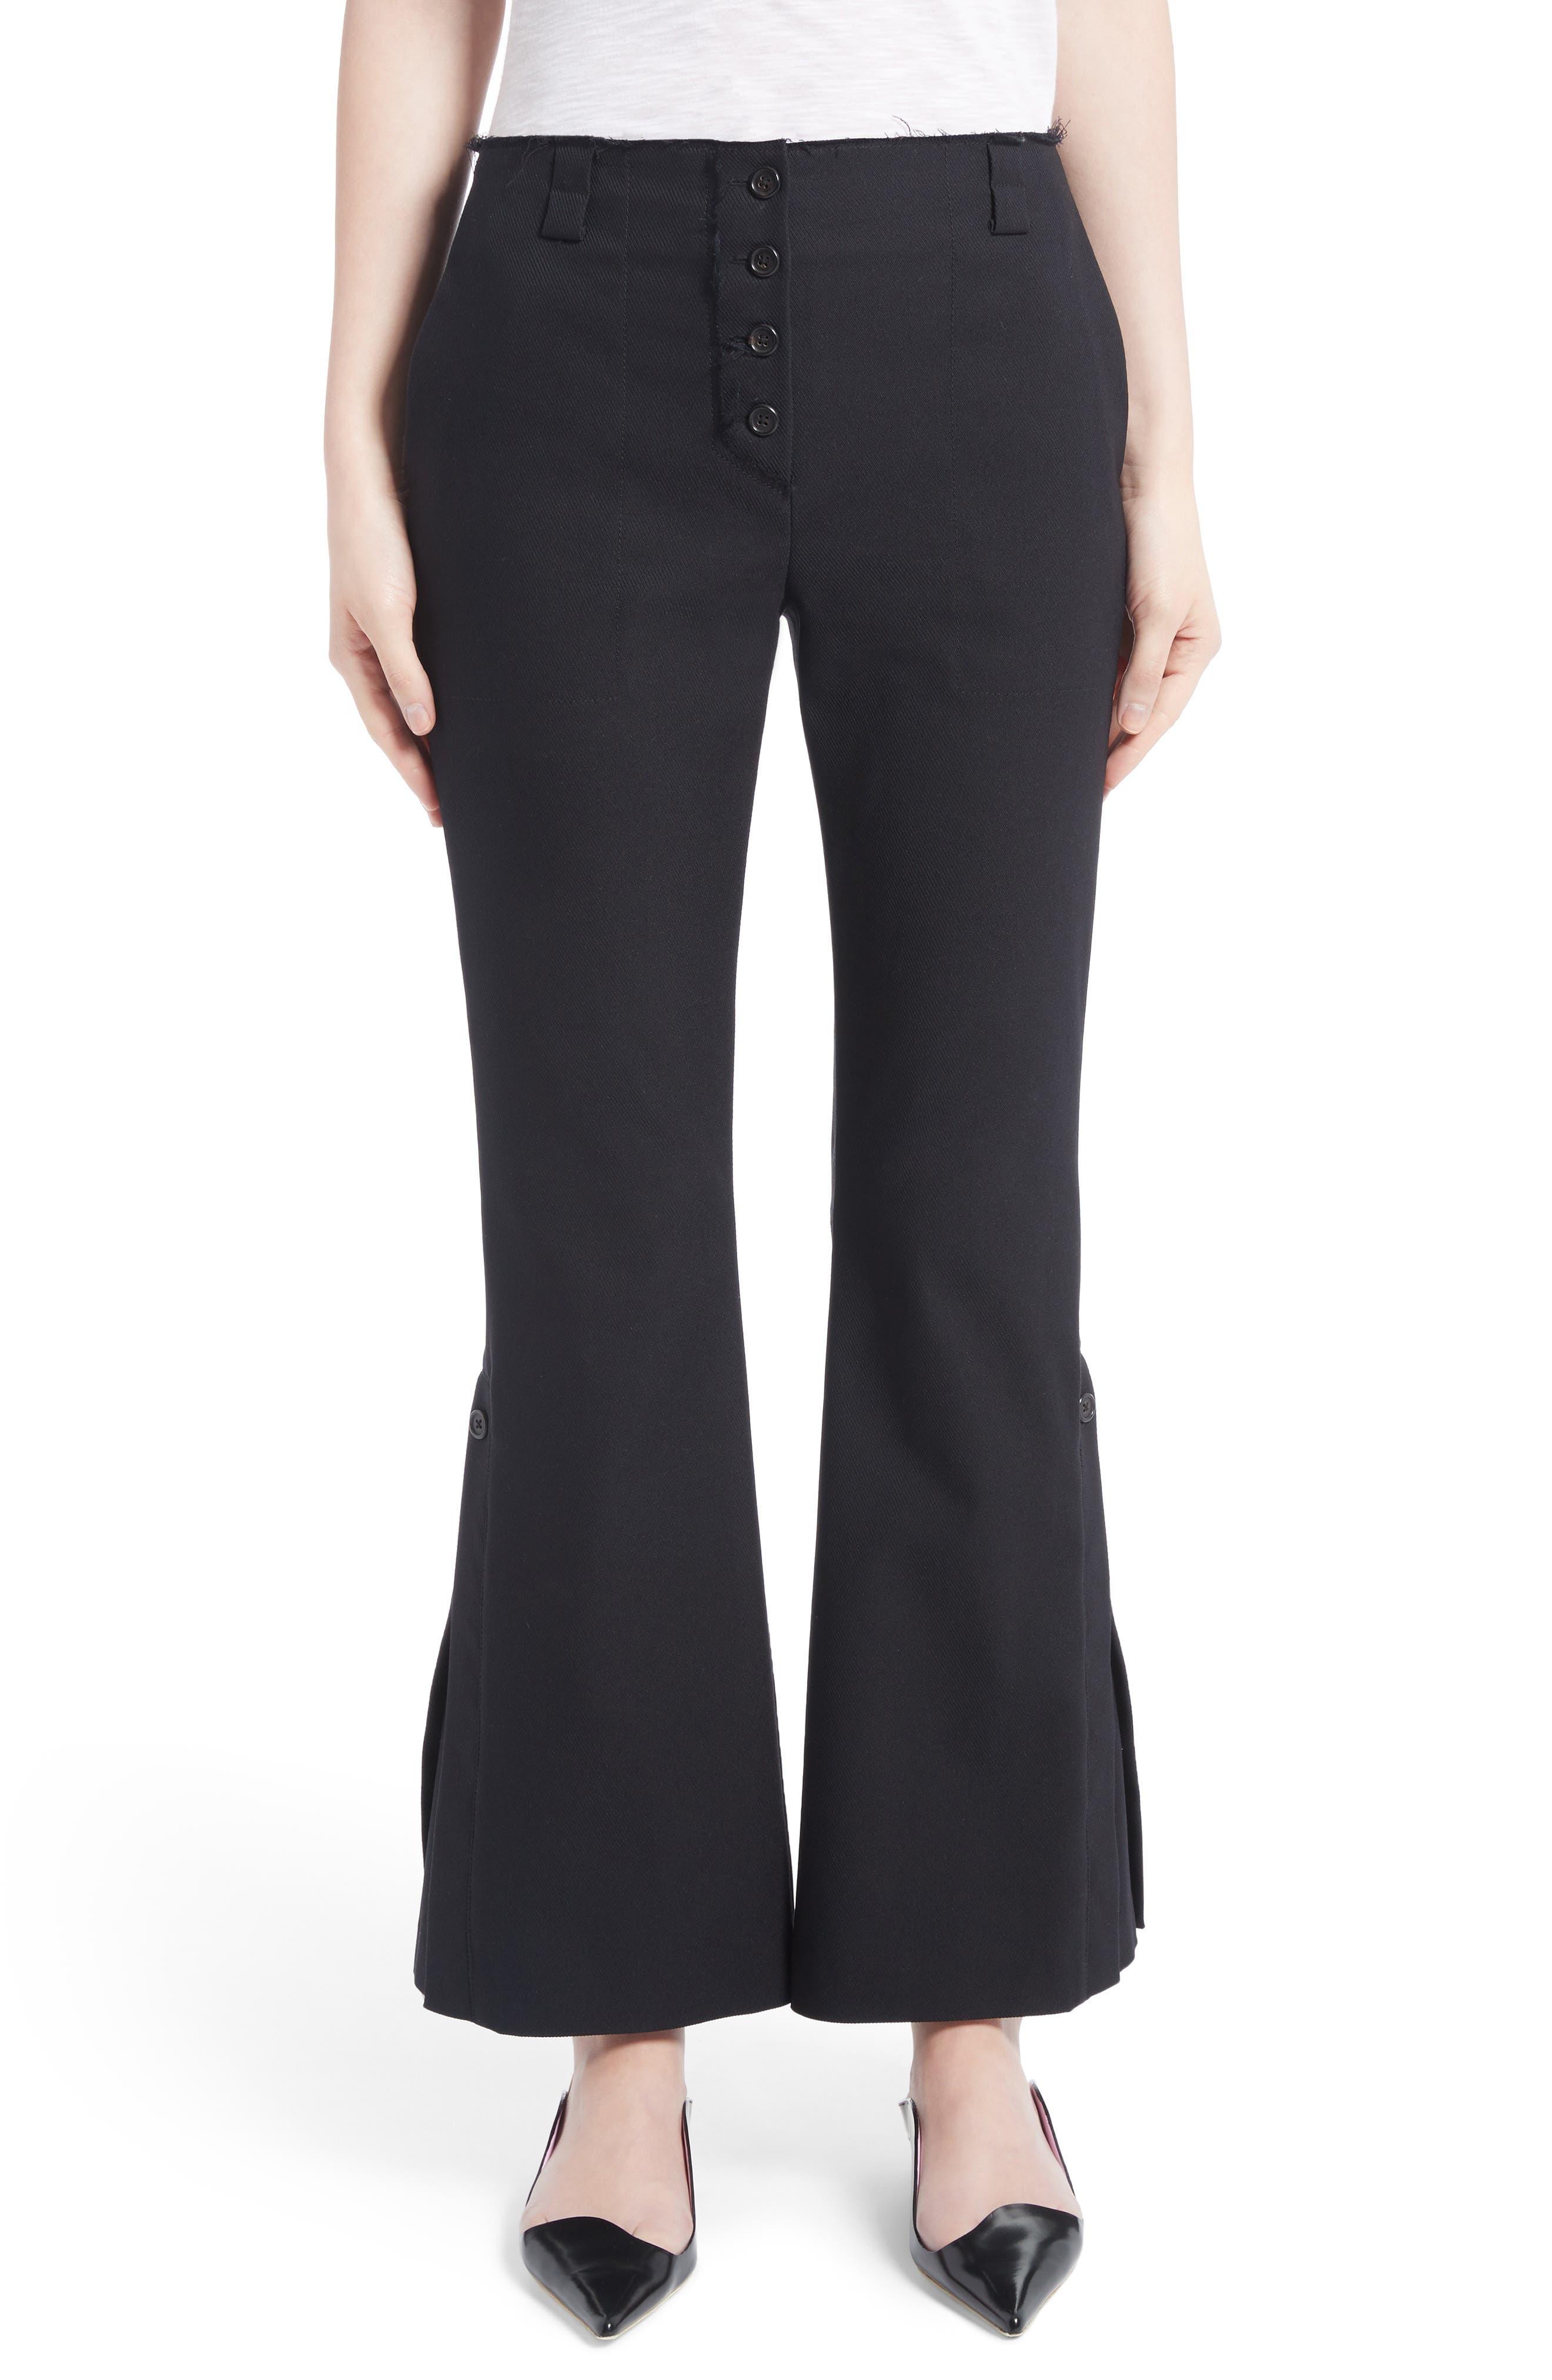 Proenza Schouler Stretch Cotton Blend Flare Pants